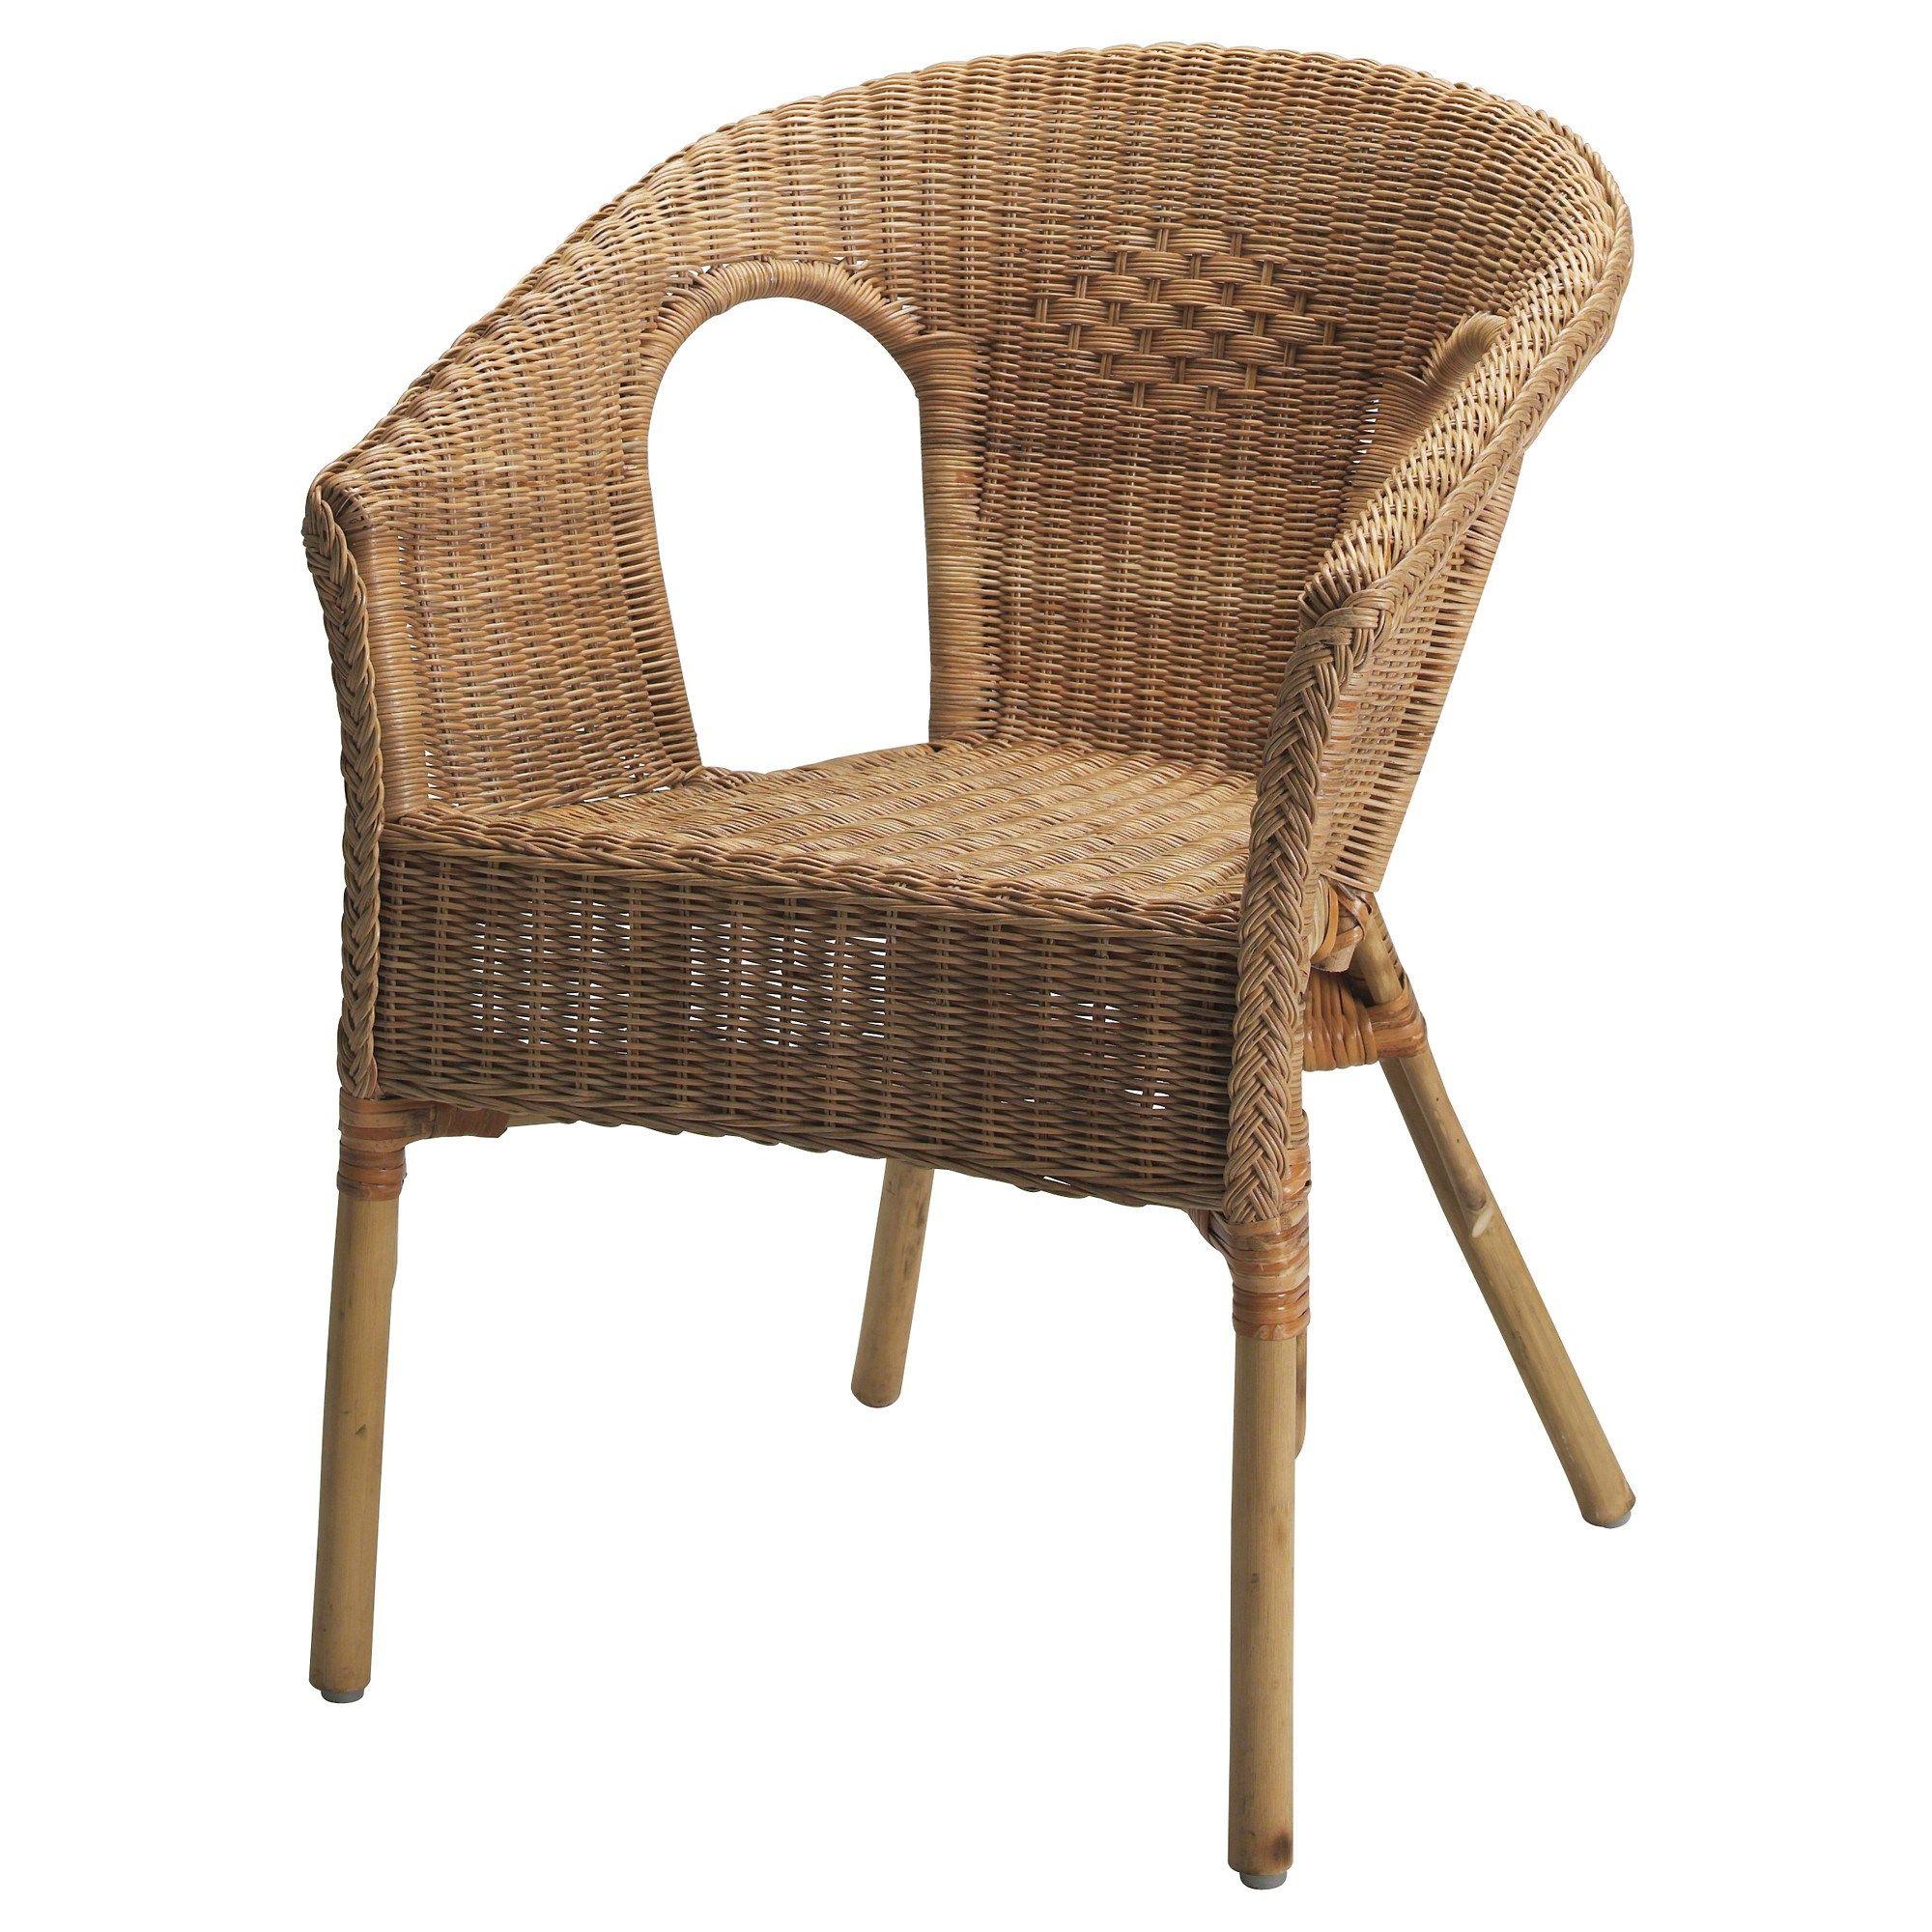 Agen Tekli Koltuk Rattan Bambu Ikea Oturma Odalari Bambu Sandalyeler Tekli Koltuk Ikea Fikirleri